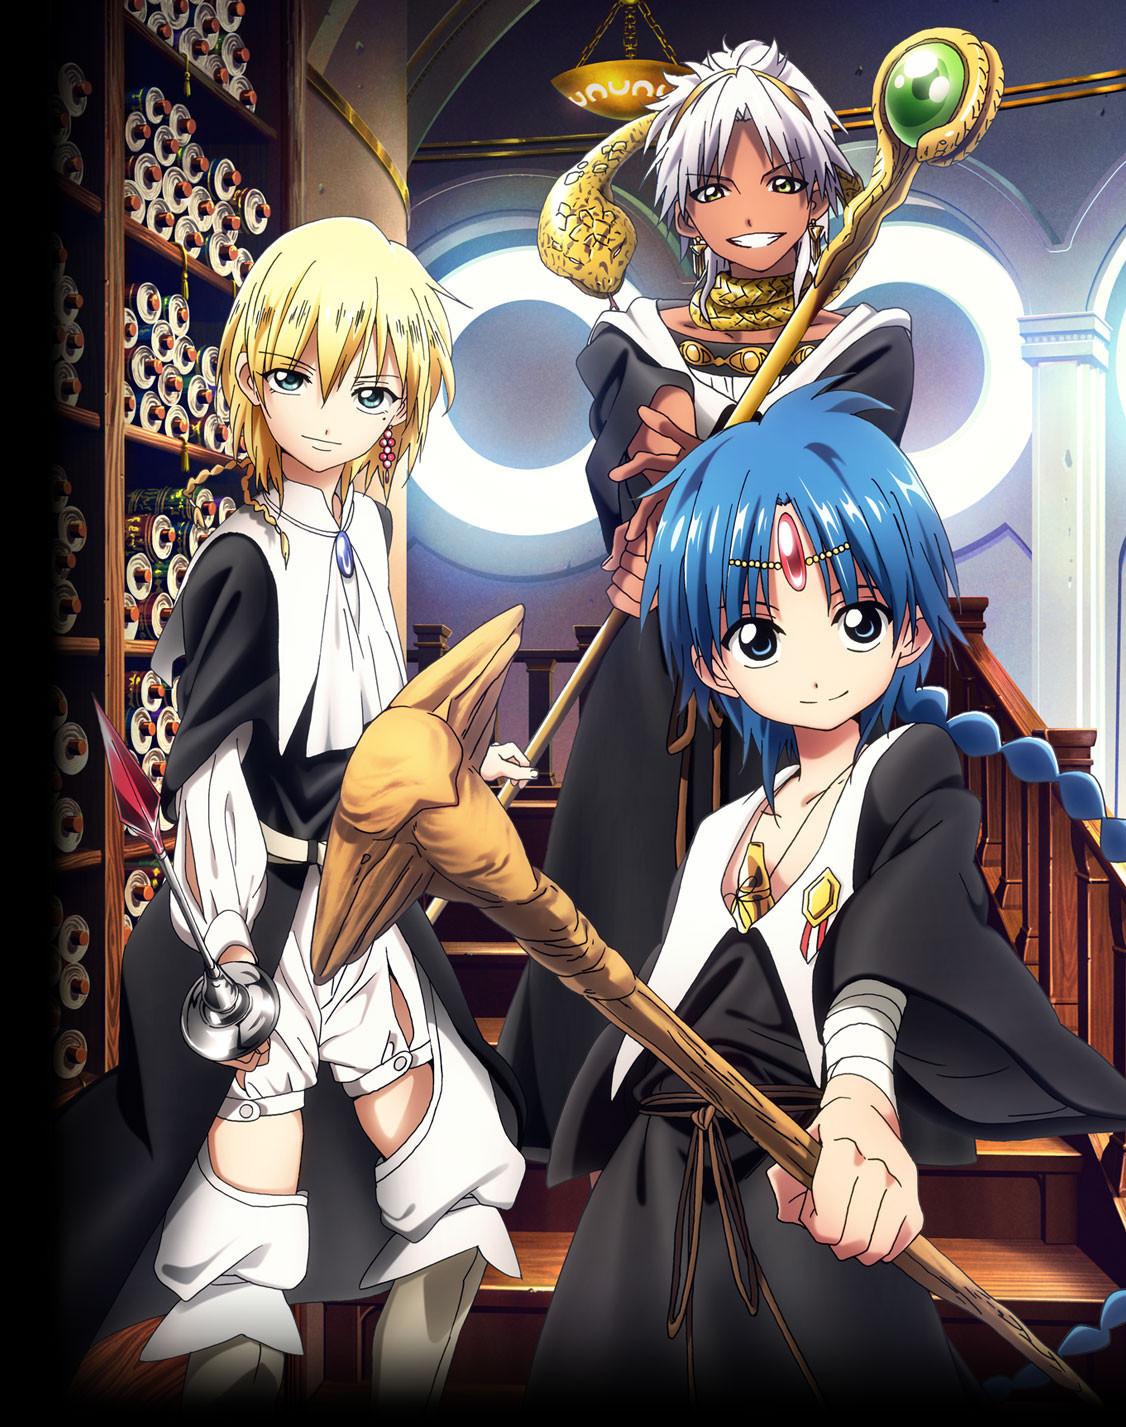 MAGI: The Labyrinth of Magic The Labyrinth Of Magic Magi (Ohtaka Shinobu)  #1547570